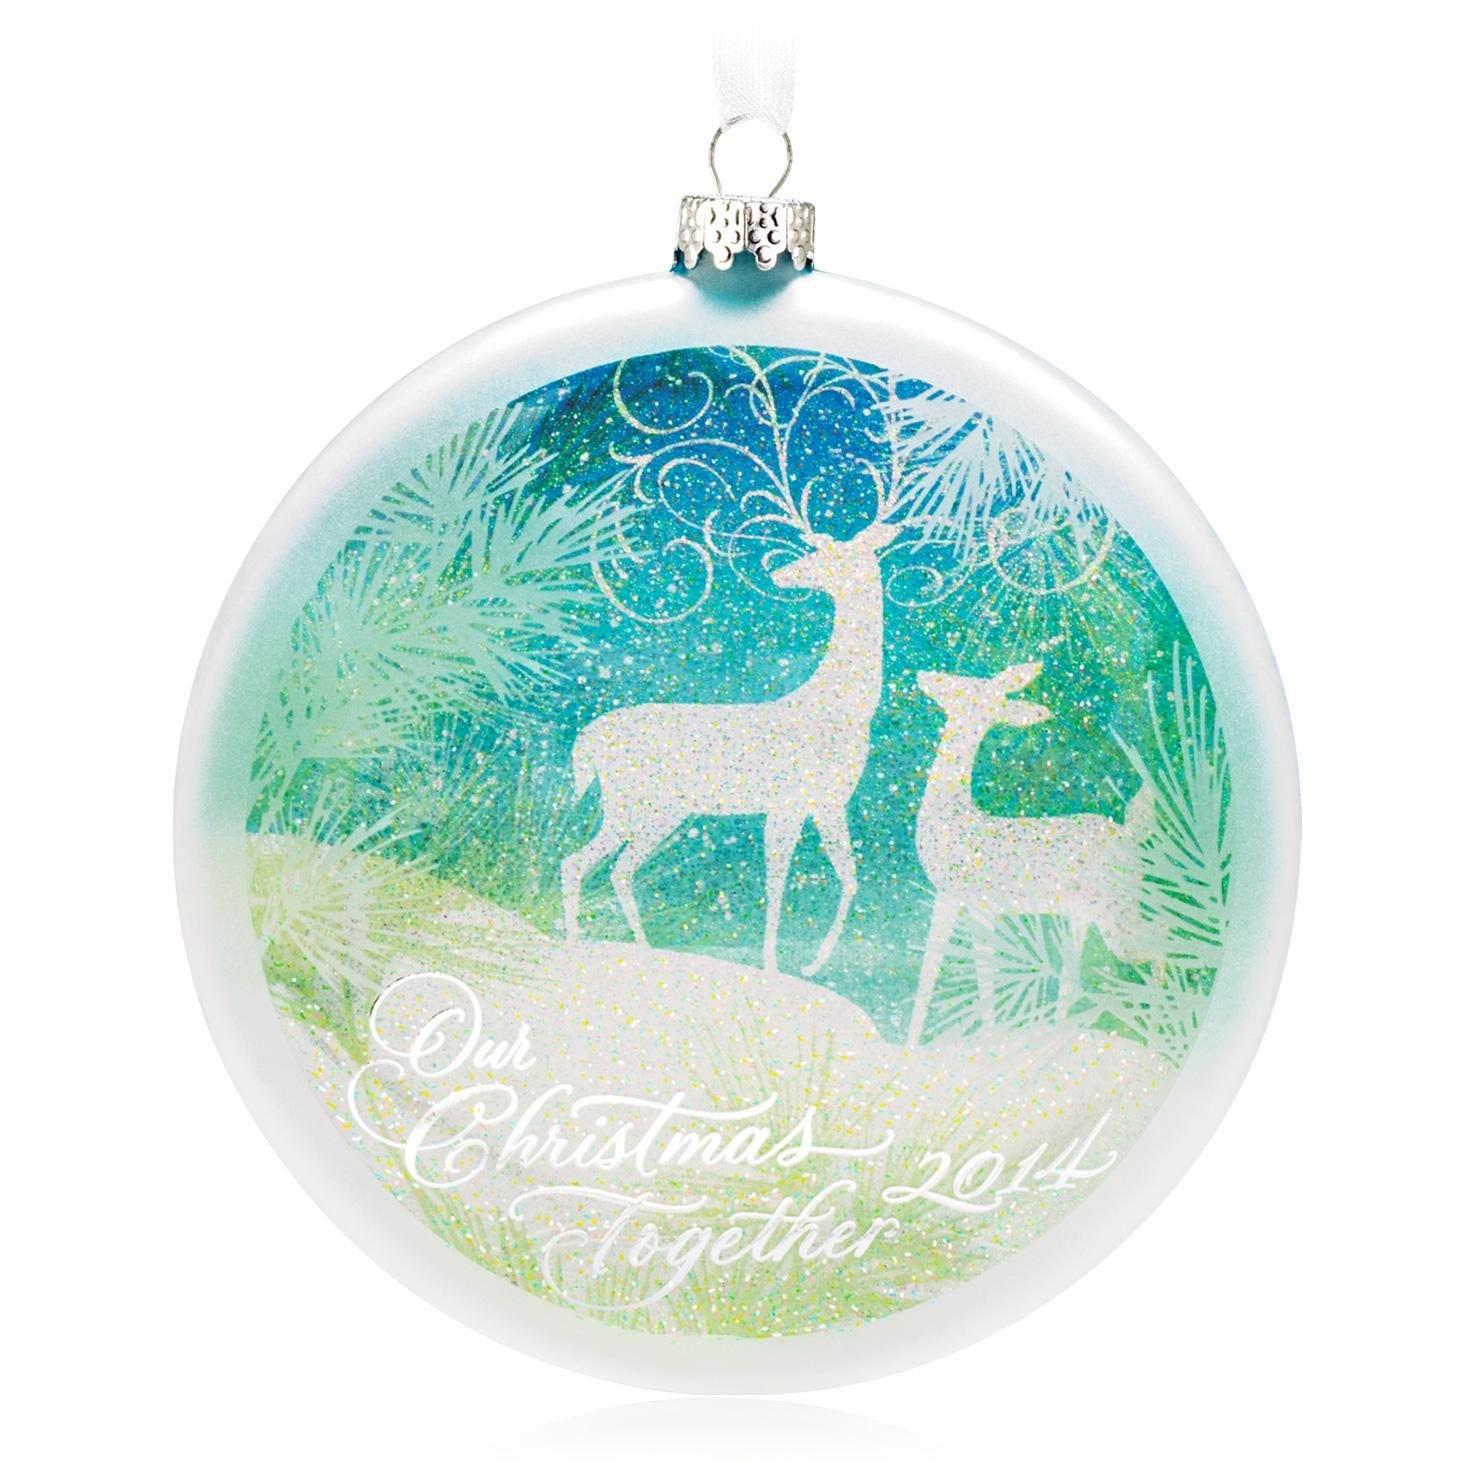 Amazon: Hallmark Qgo1163 Our Christmas Together 2014  Keepsake Ornament:  Home & Kitchen